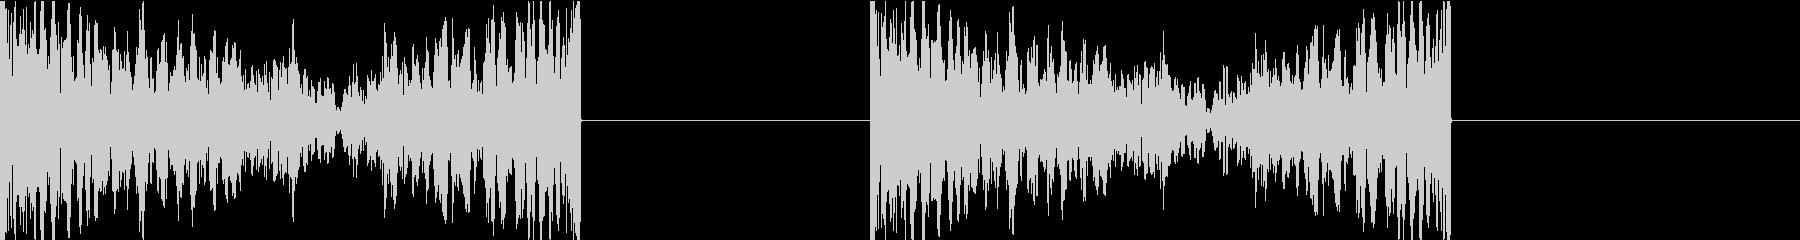 DJプレイ スクラッチ・ノイズ 269の未再生の波形